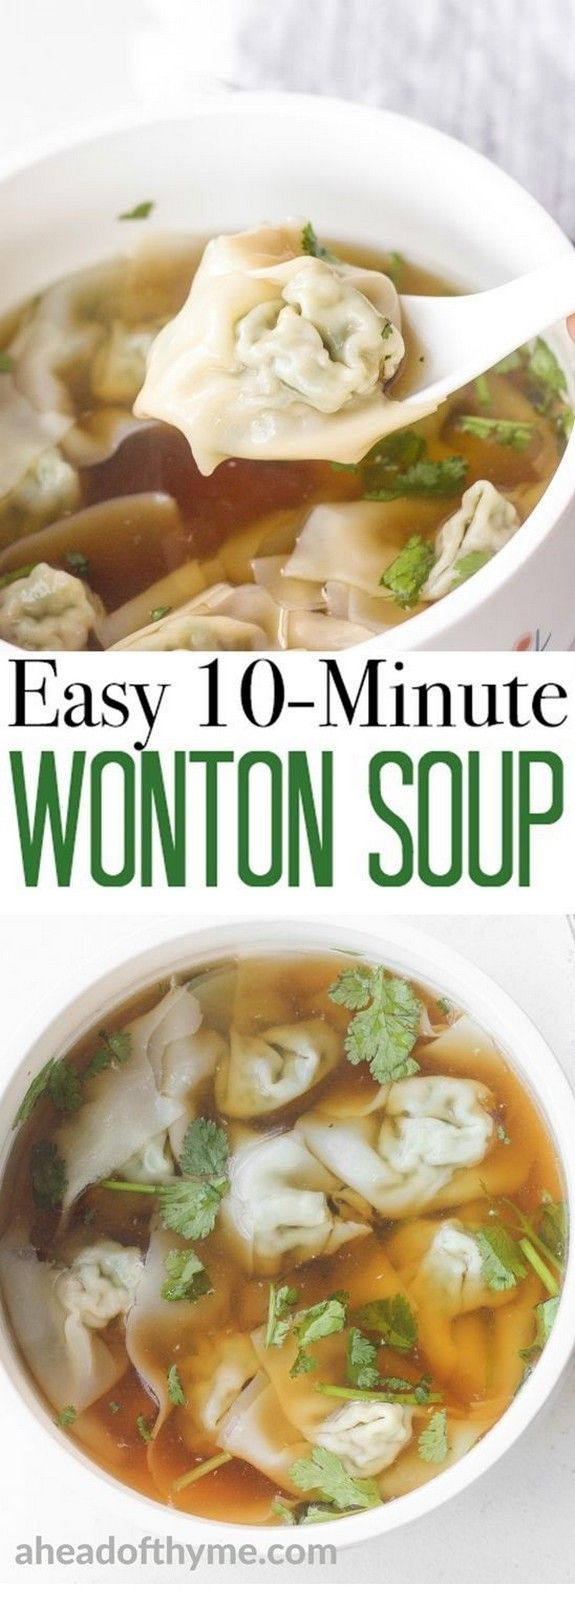 Easy-10-Minute Wonton Soup | Tasty Food #chinesefood